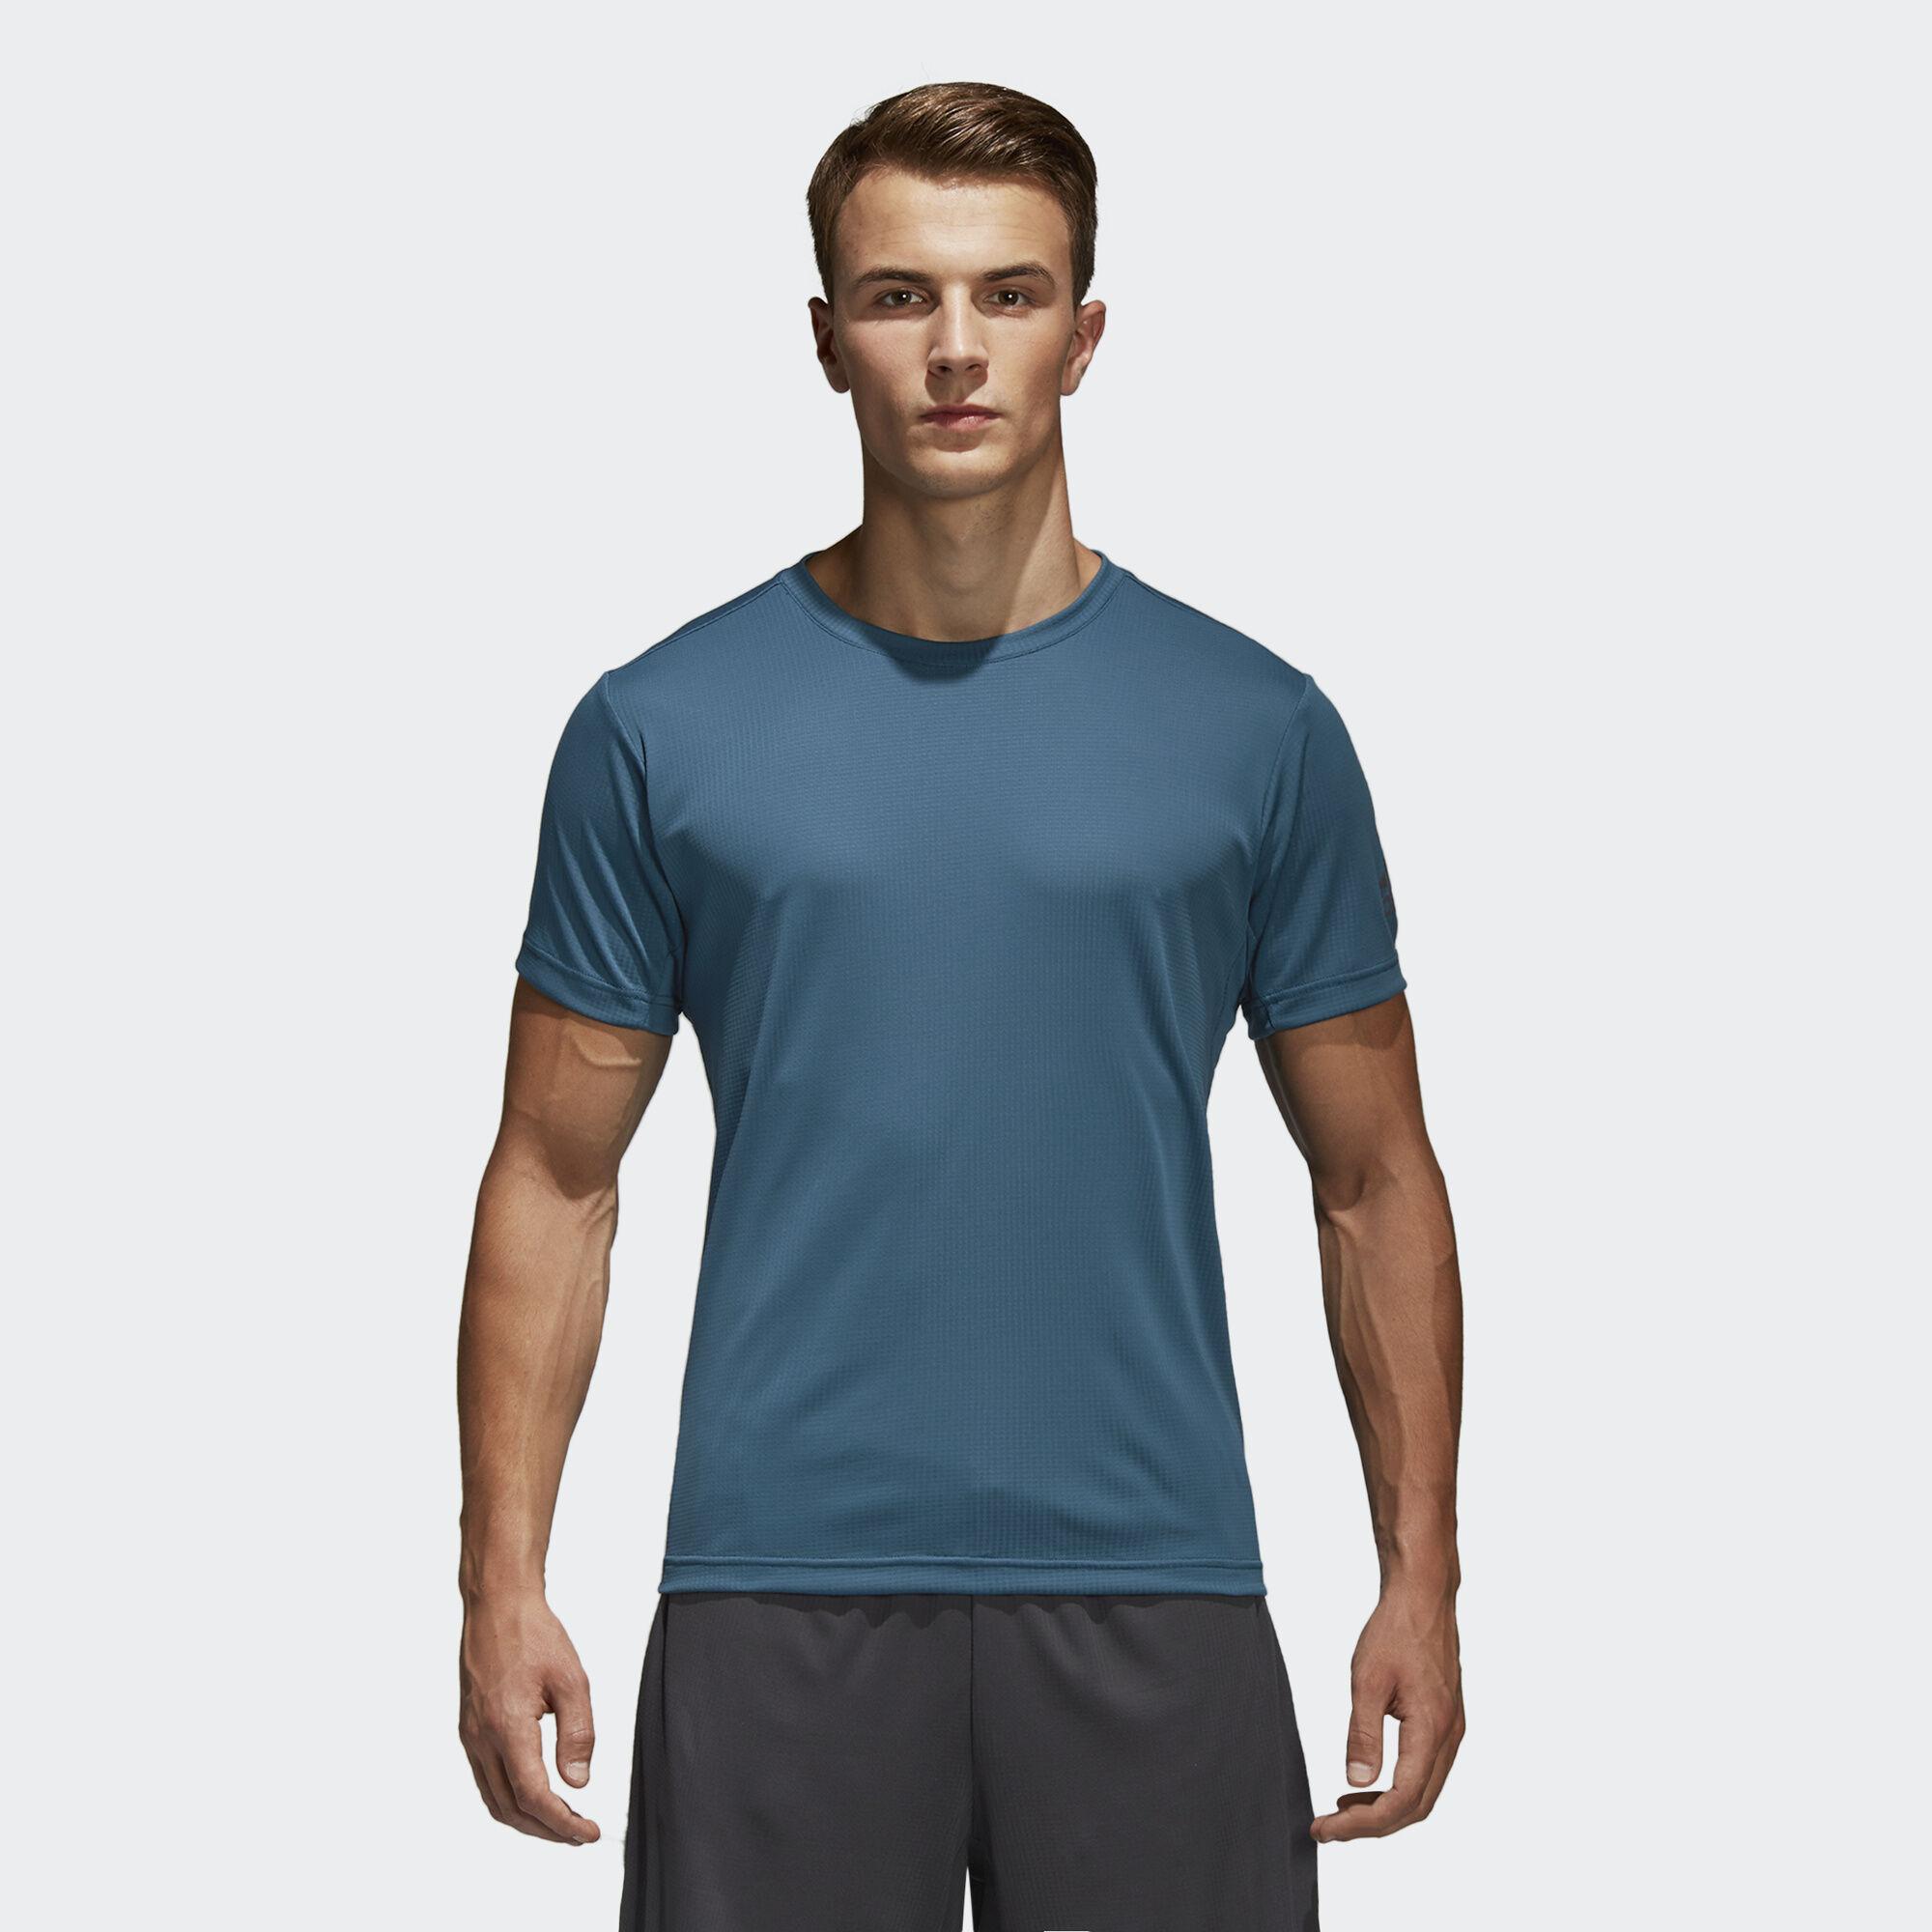 adidas - FreeLift Climachill Tee Blue CE0819. Men Training